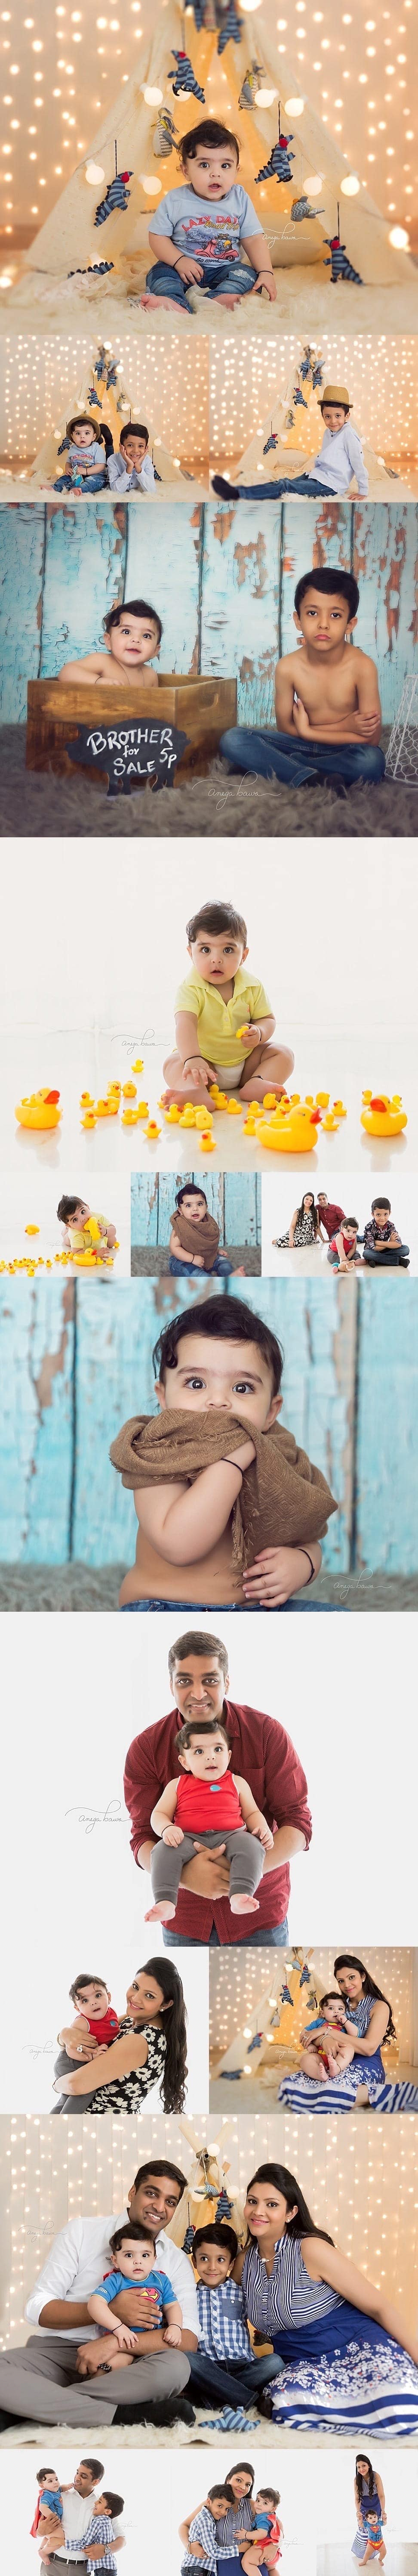 sitter_session_7-months-boy_baby_child